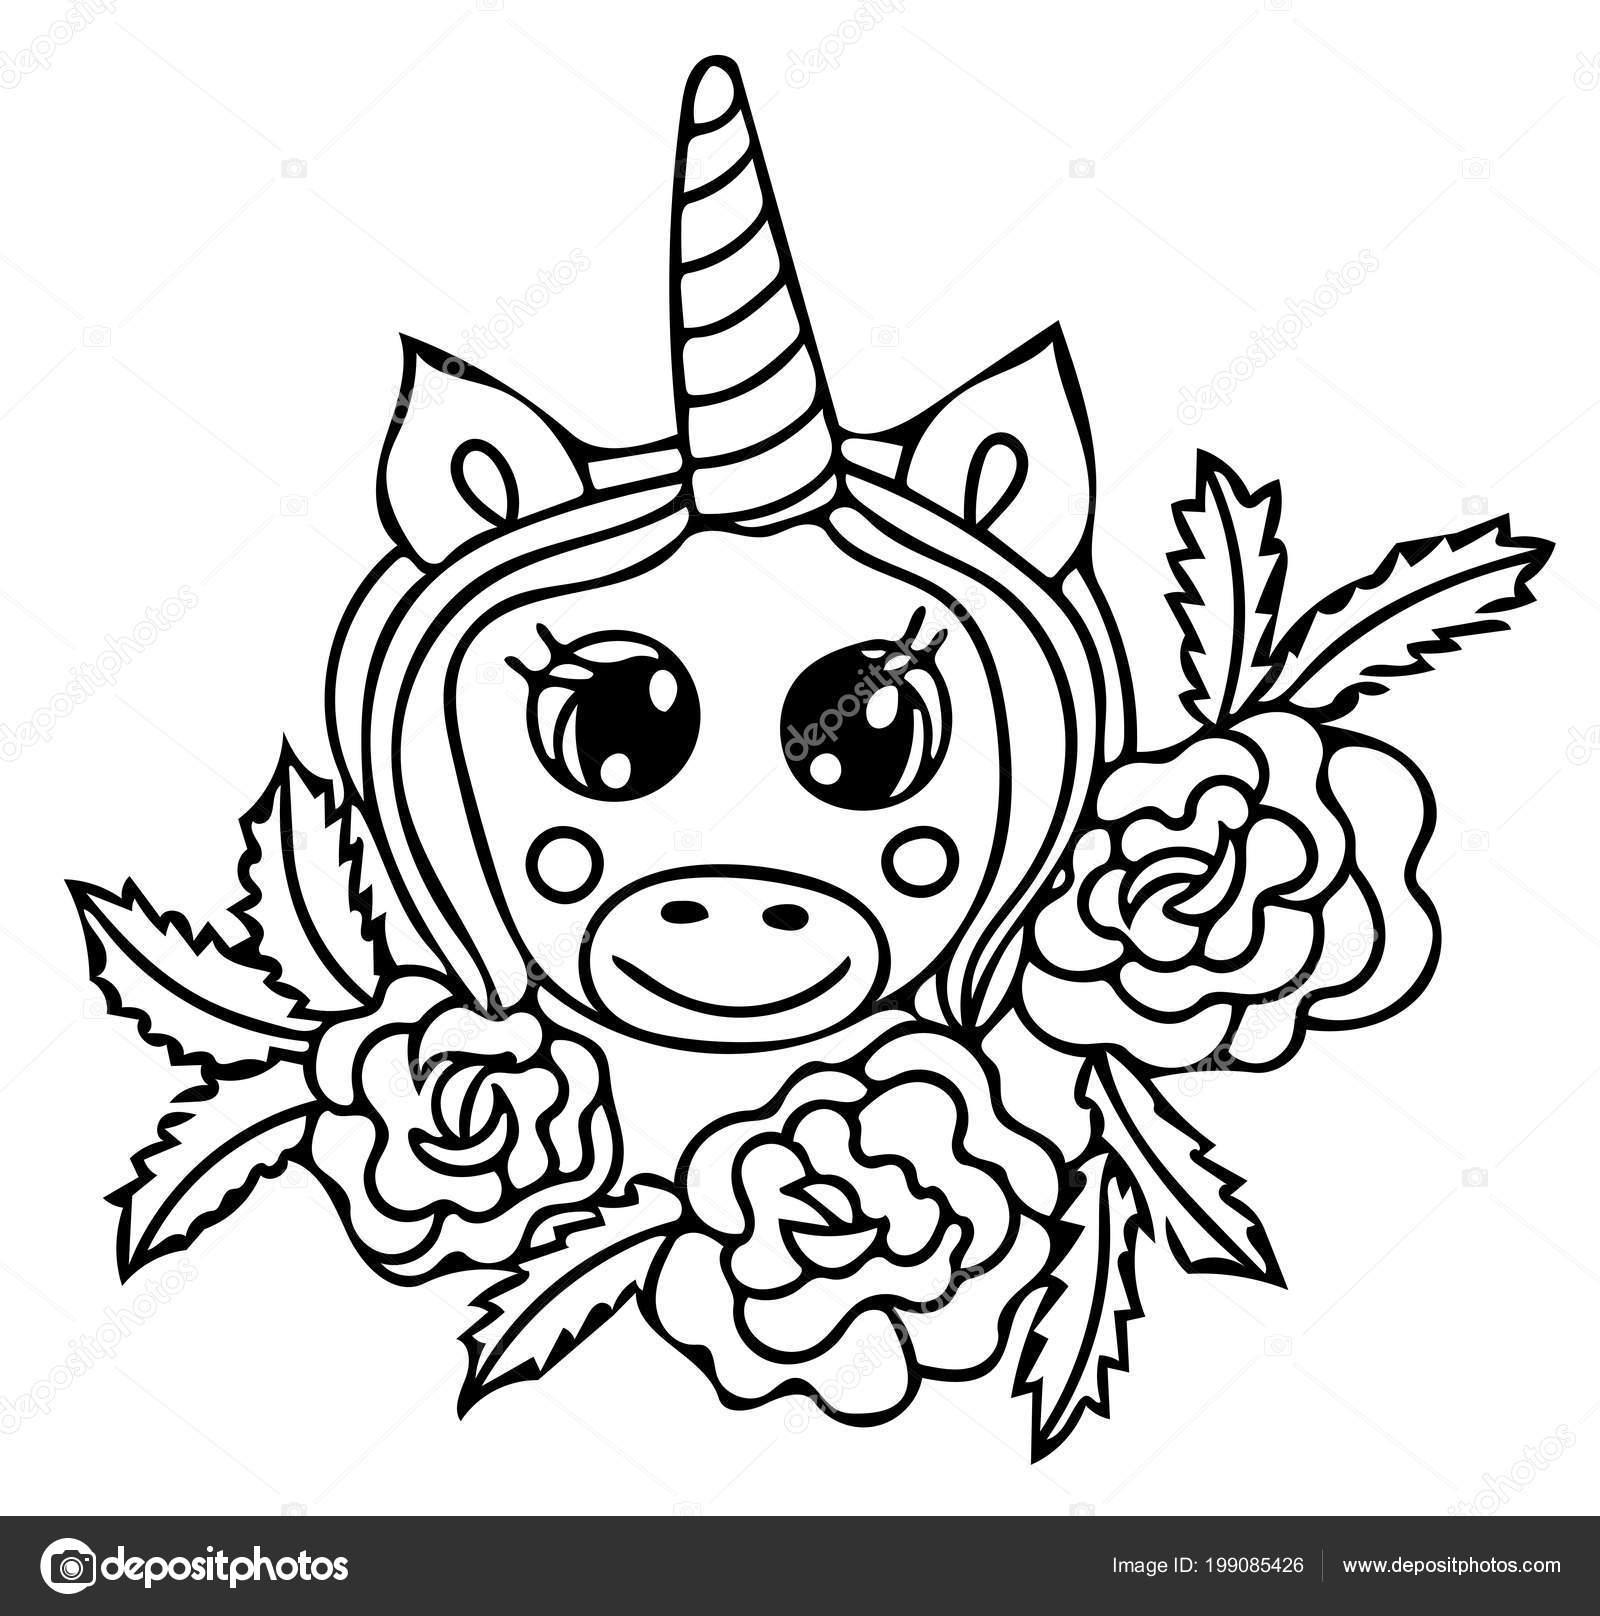 unicorn kleurplaat a4